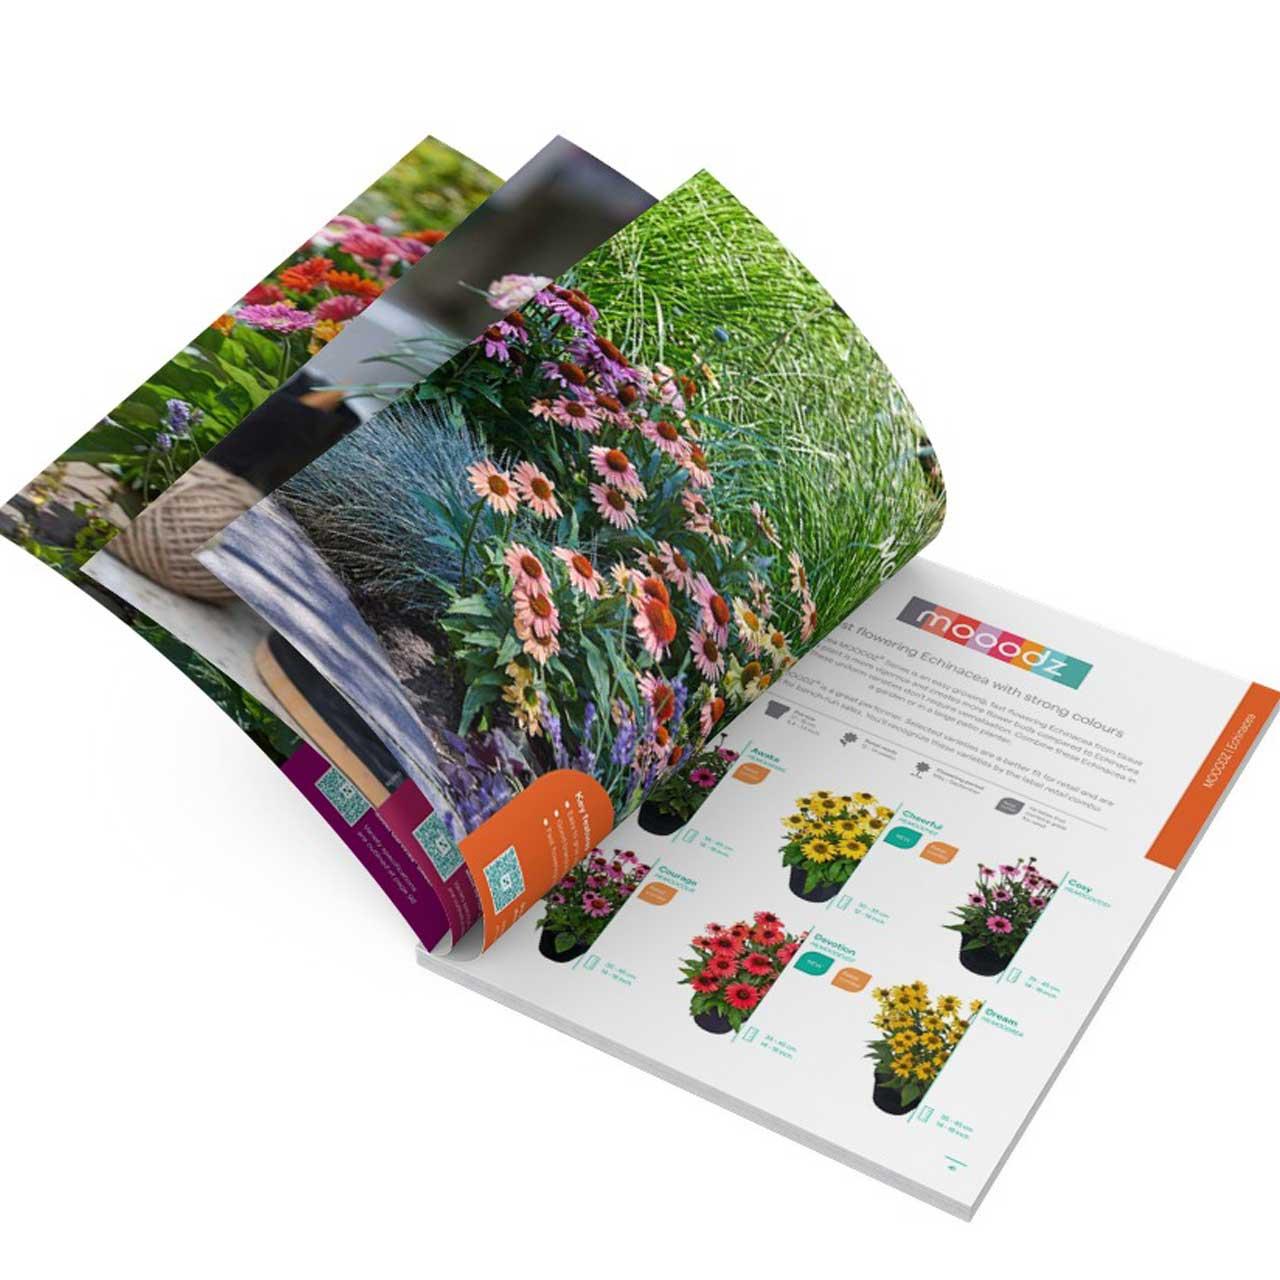 HilverdaFlorist-Pot-and-Garden-Catalogue-2022